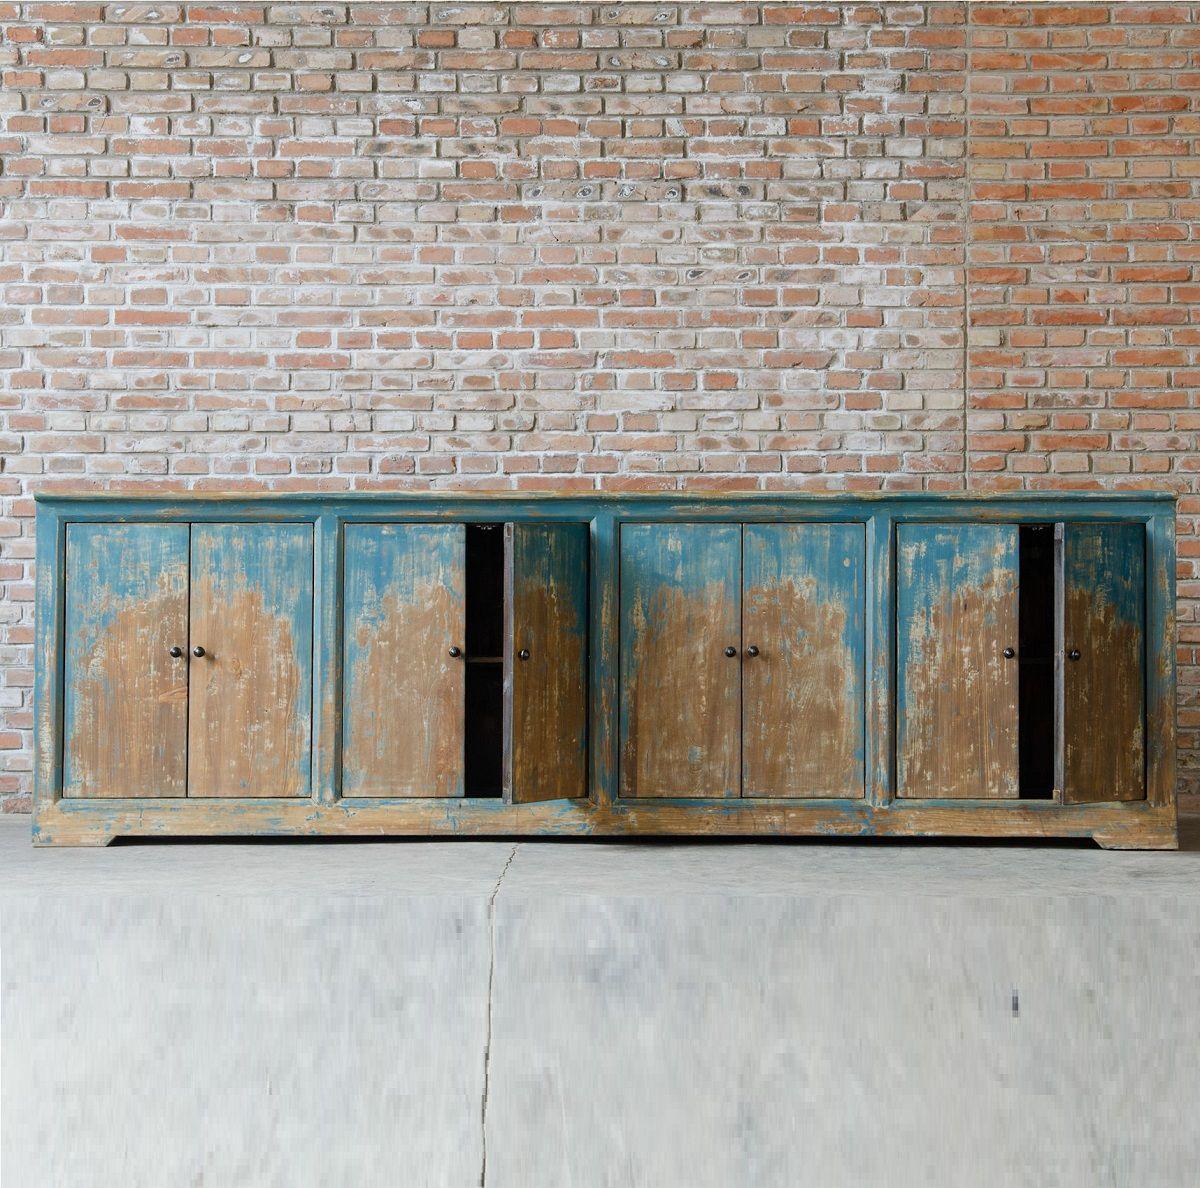 Van thiel the it takes an hour sideboard doors basements and doors